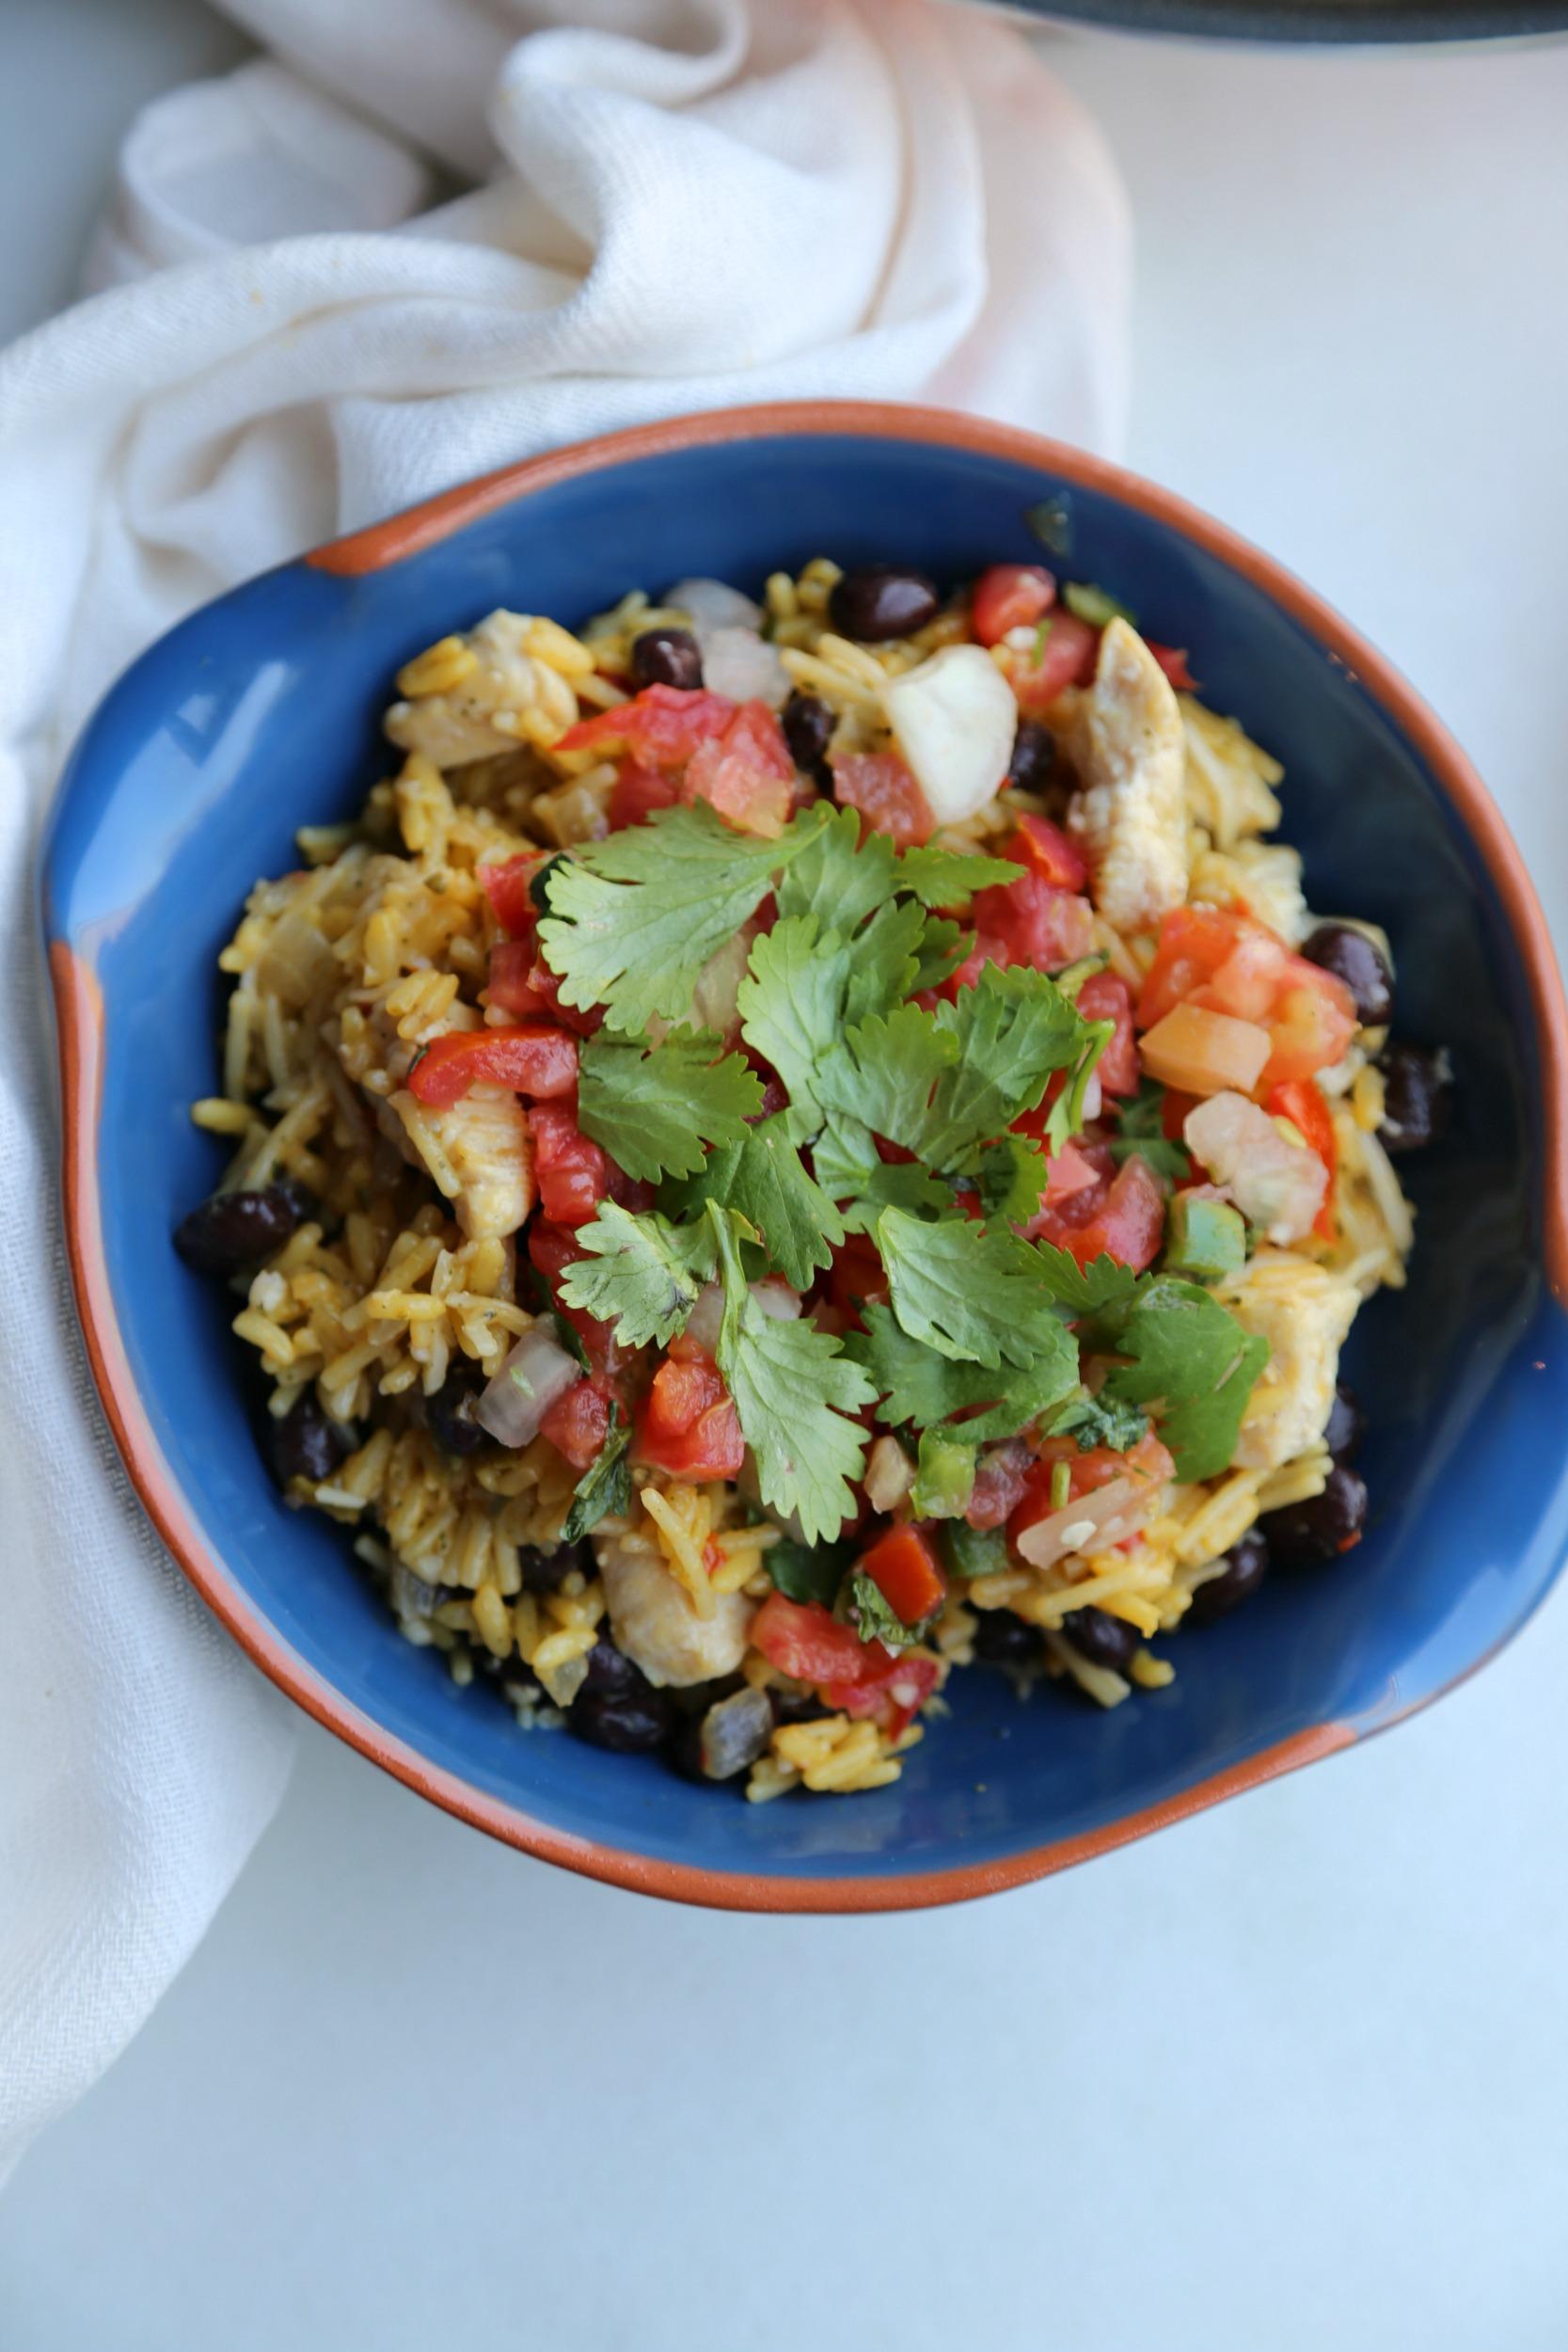 burrito-bowls-chicken-vianneyrodriguez-sweetlifebake